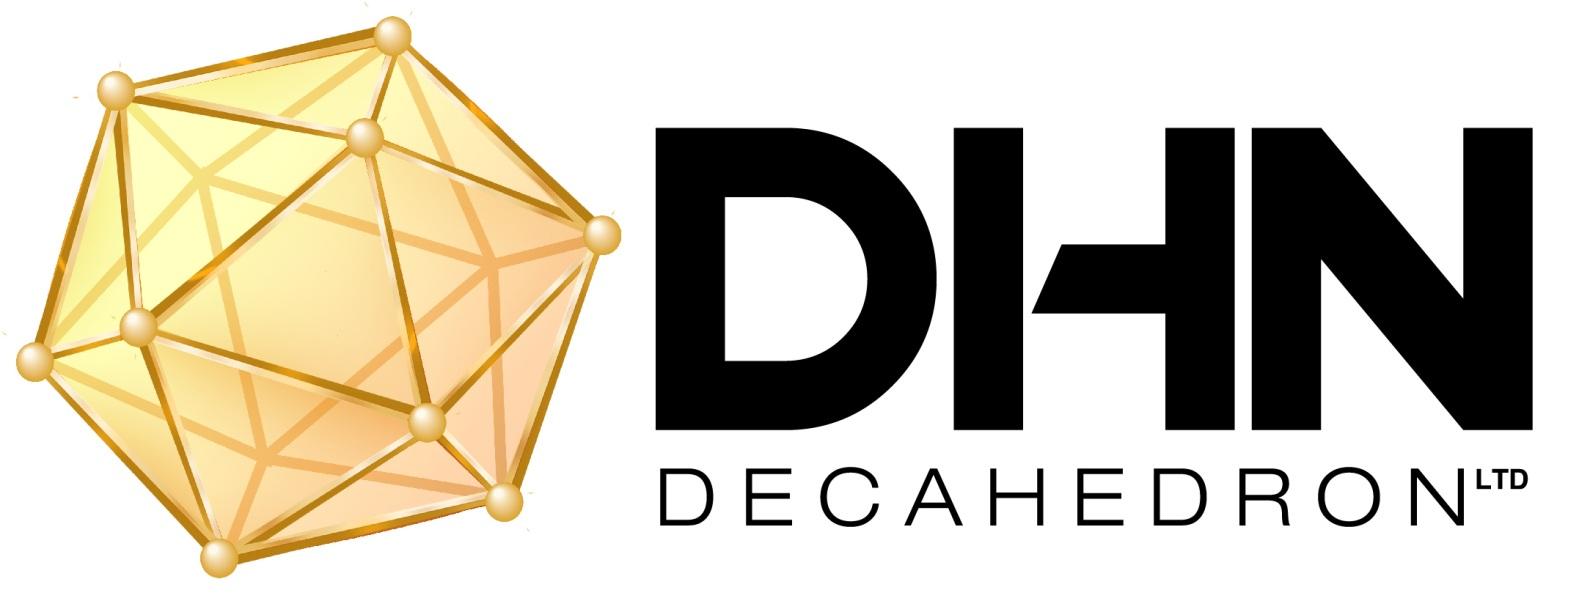 decahedron ltd medical articles harlow decahedron ltd in